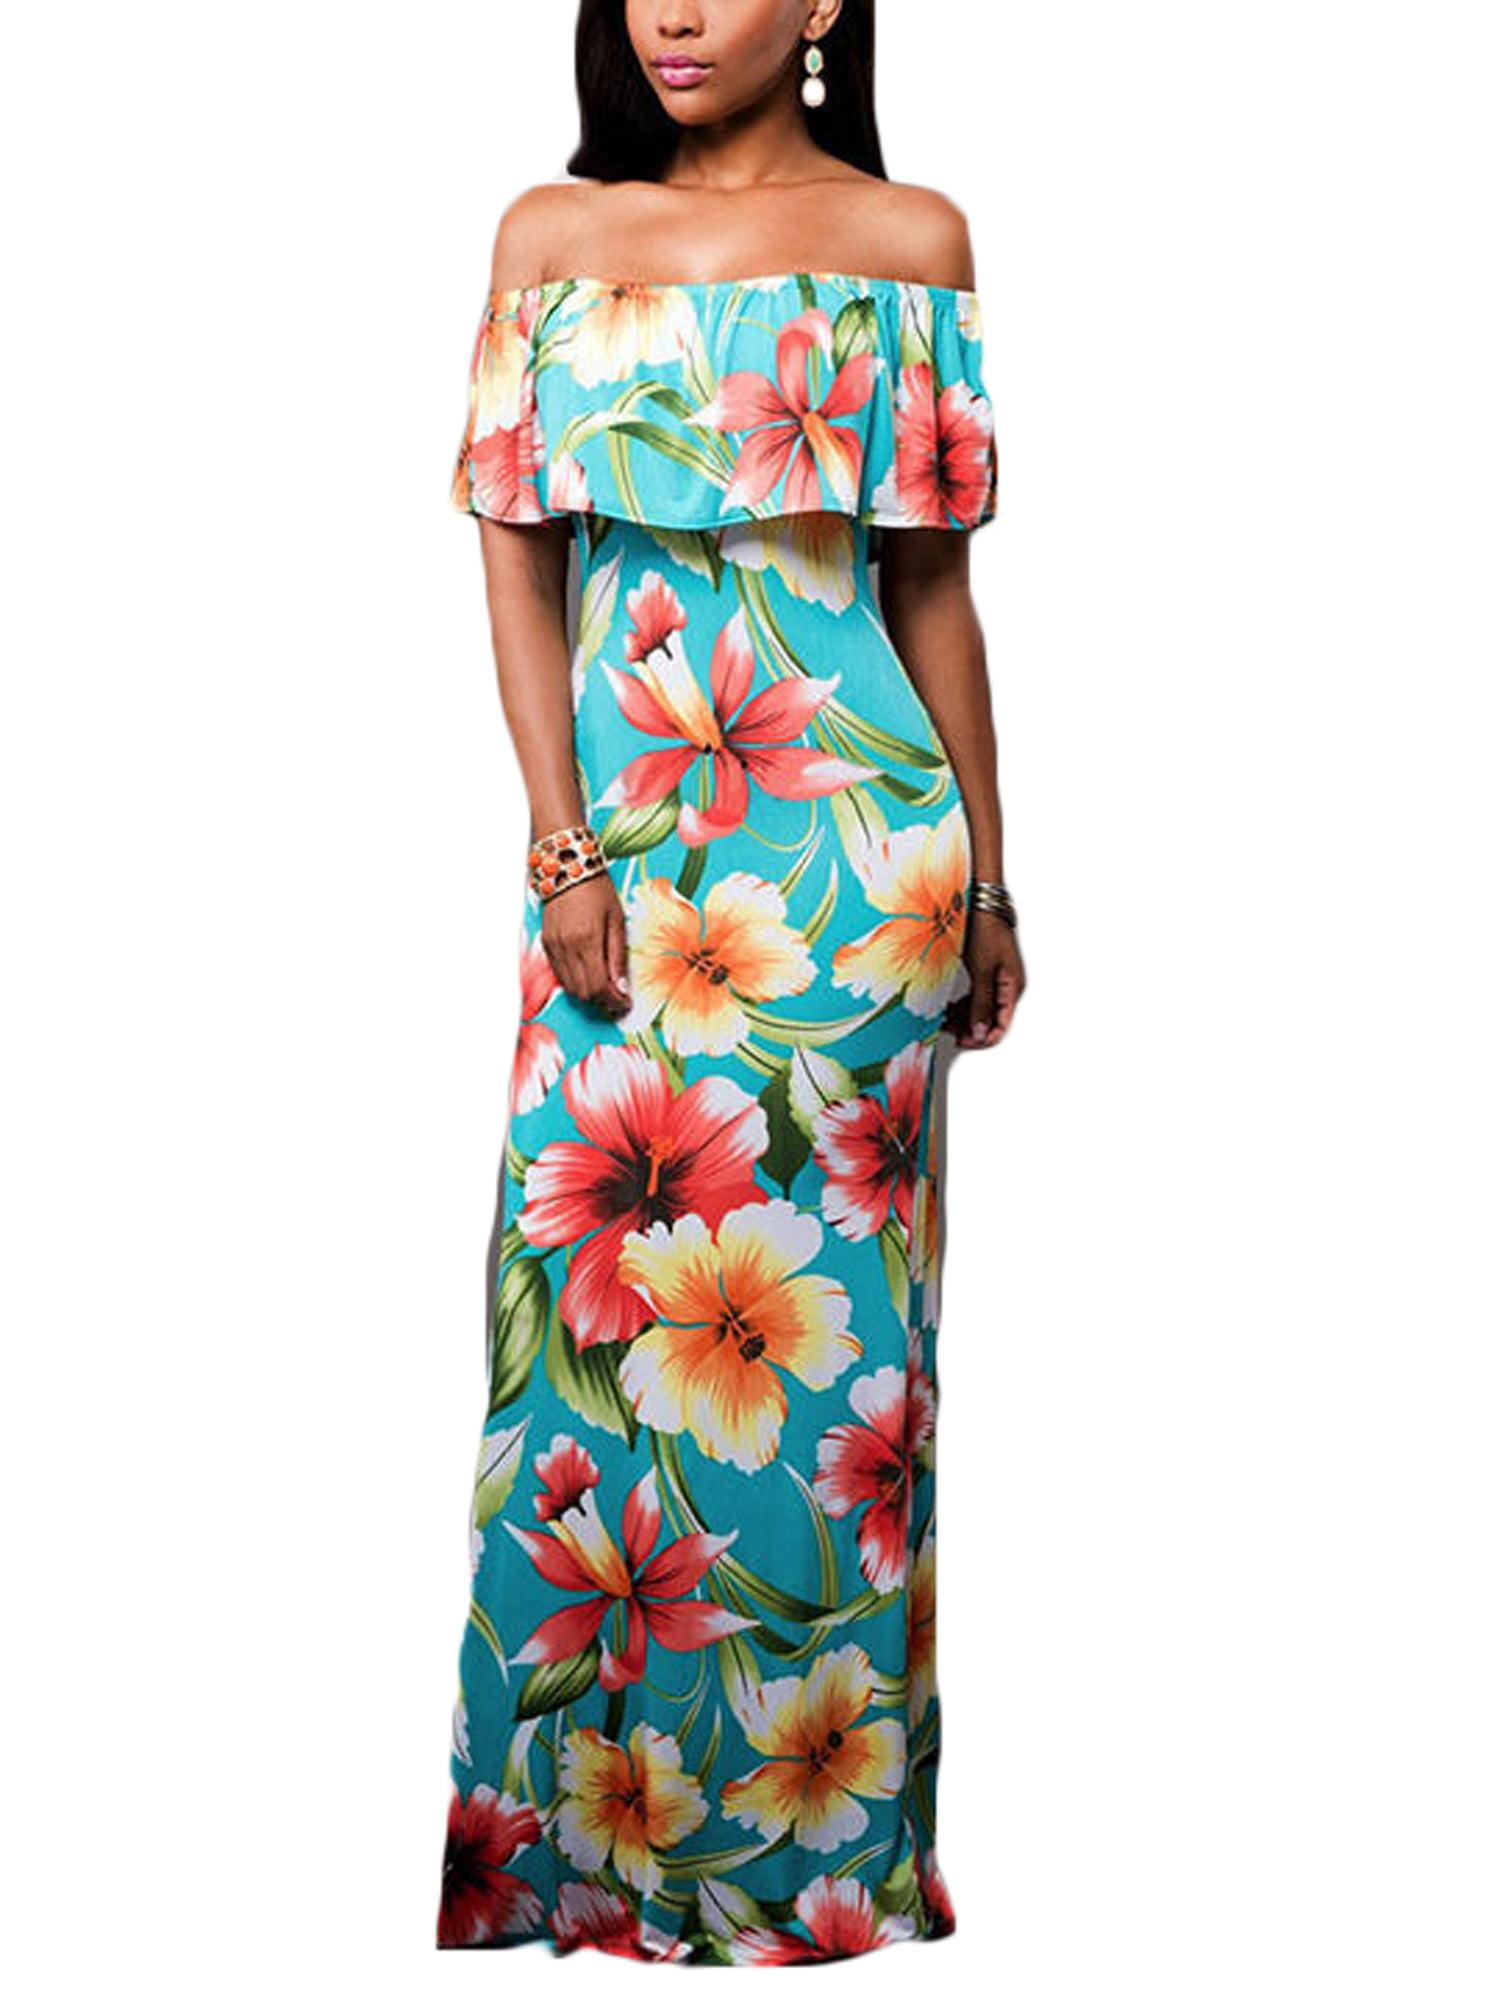 Women Floral Boho Dress Womens Off The Shoulder Boho Lady Sundrss Maxi Summer Party Beach